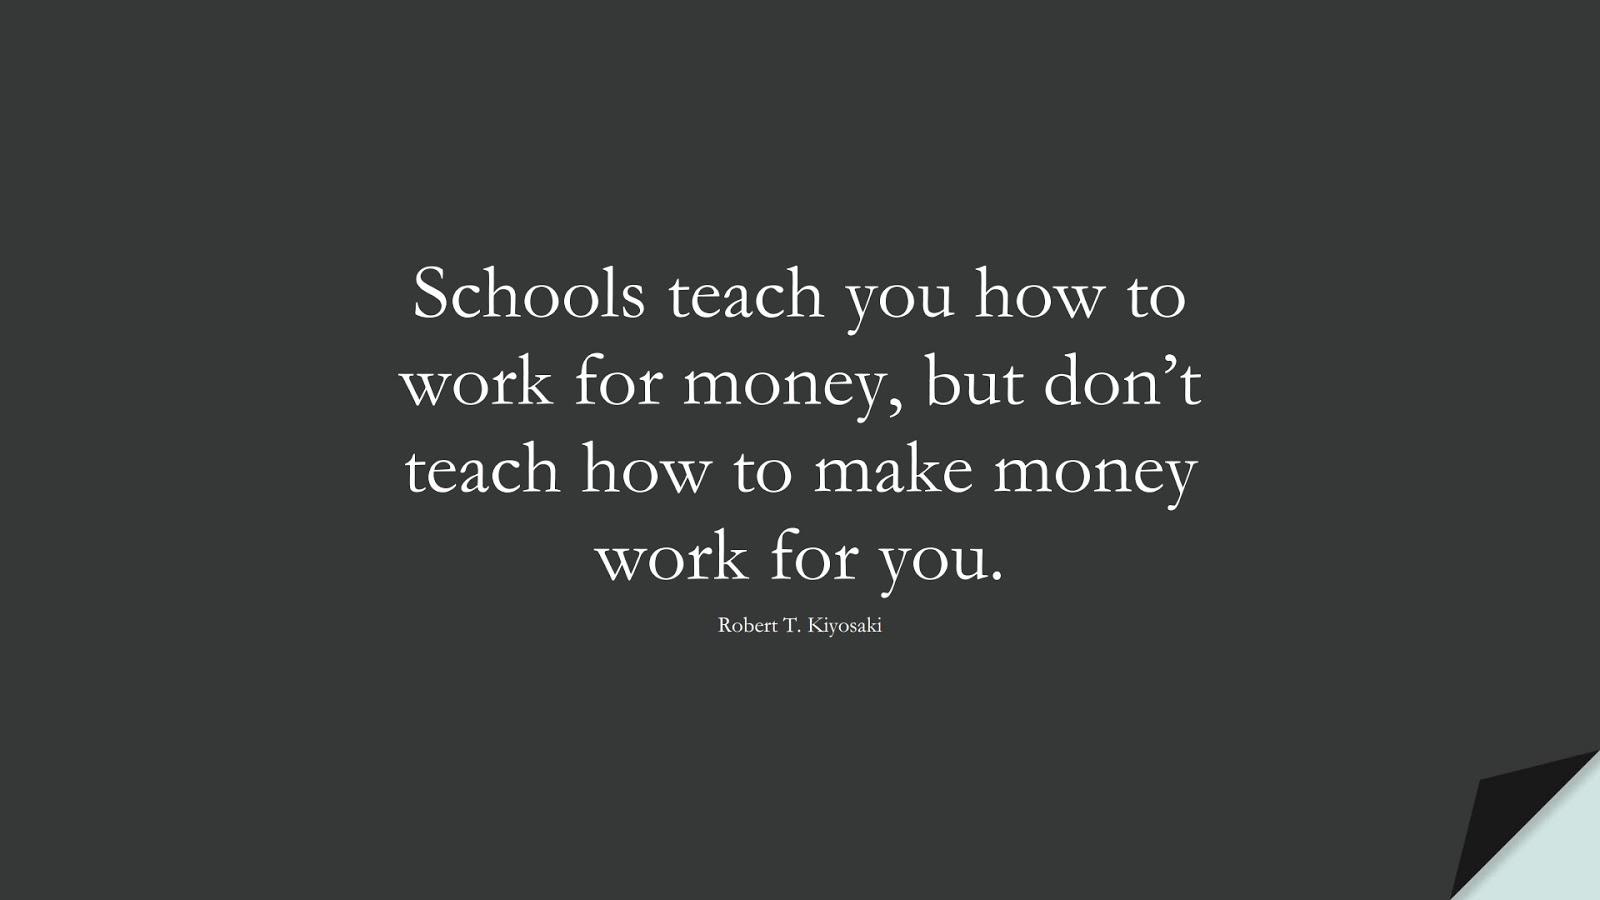 Schools teach you how to work for money, but don't teach how to make money work for you. (Robert T. Kiyosaki);  #MoneyQuotes